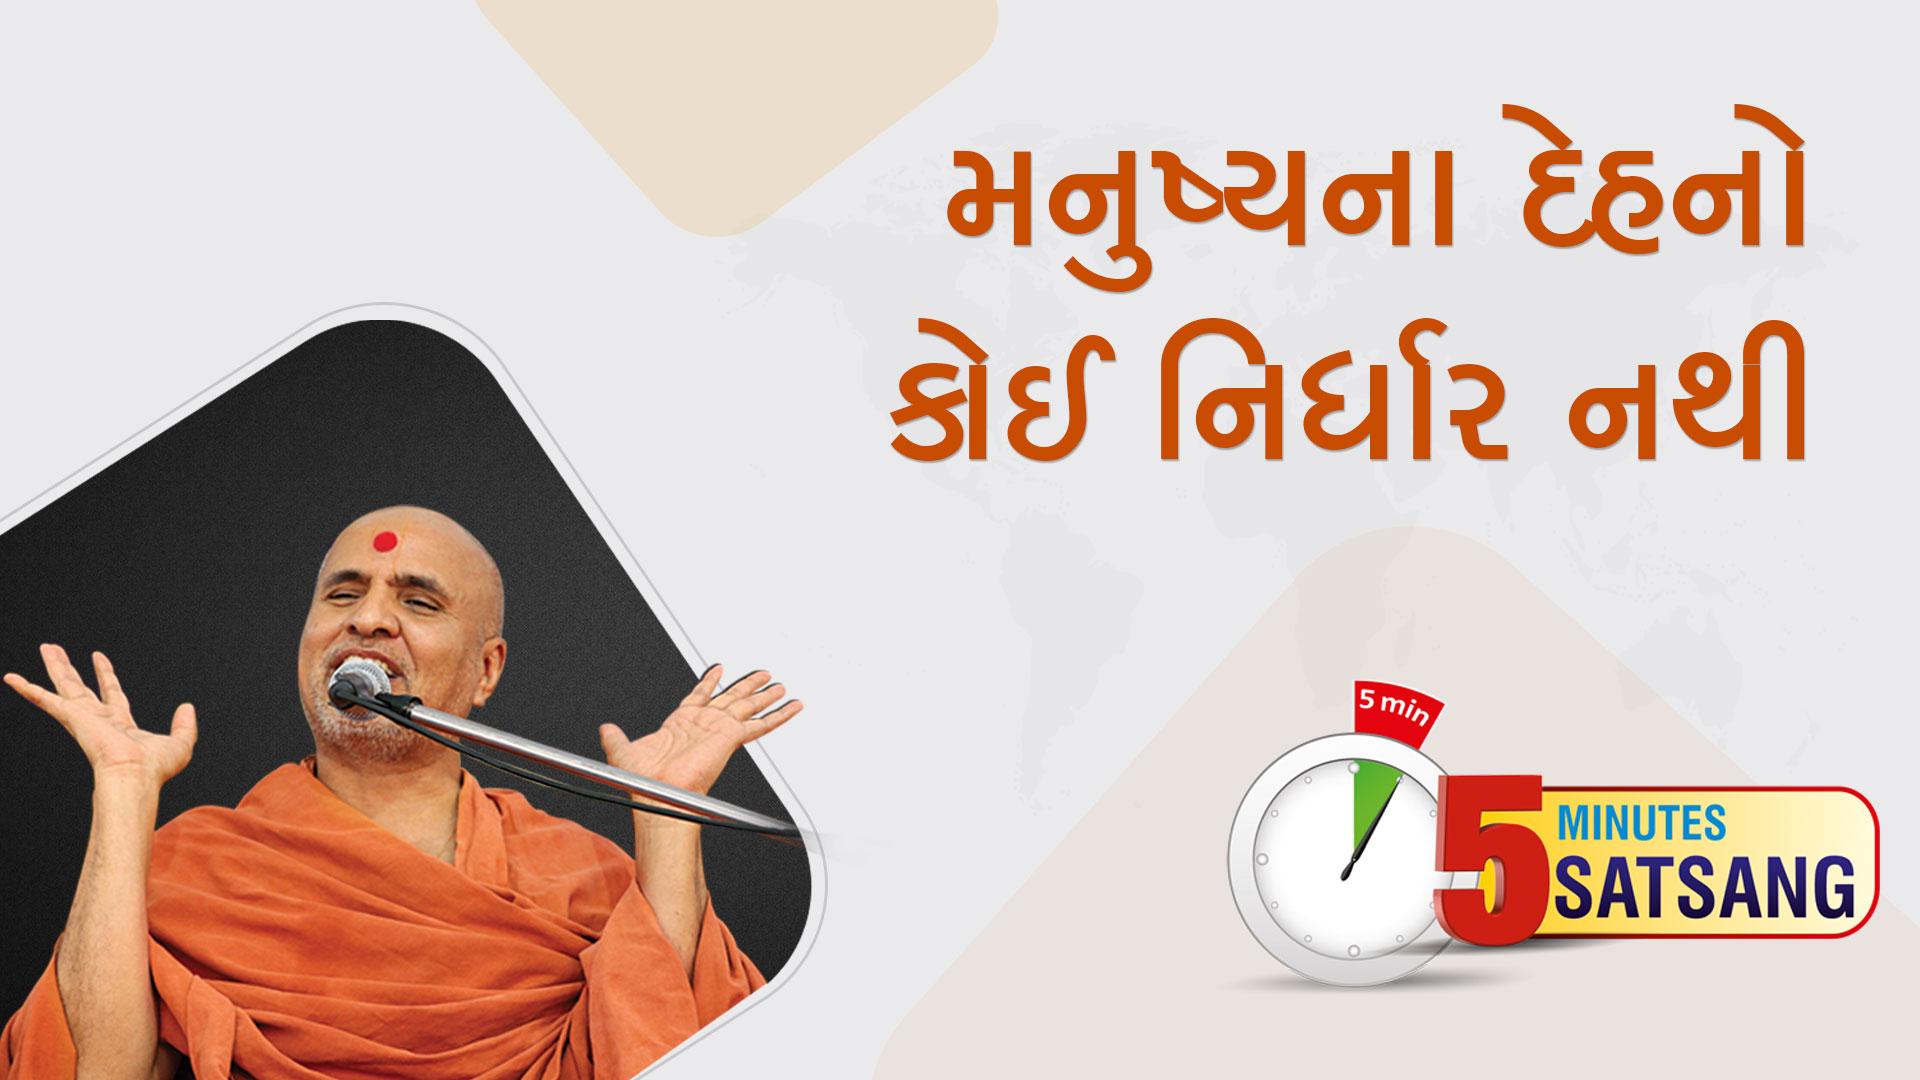 Manushya Na Deh No Koi Nirdhar Nathi | 5 Minutes Satsang | HDH Swamishri